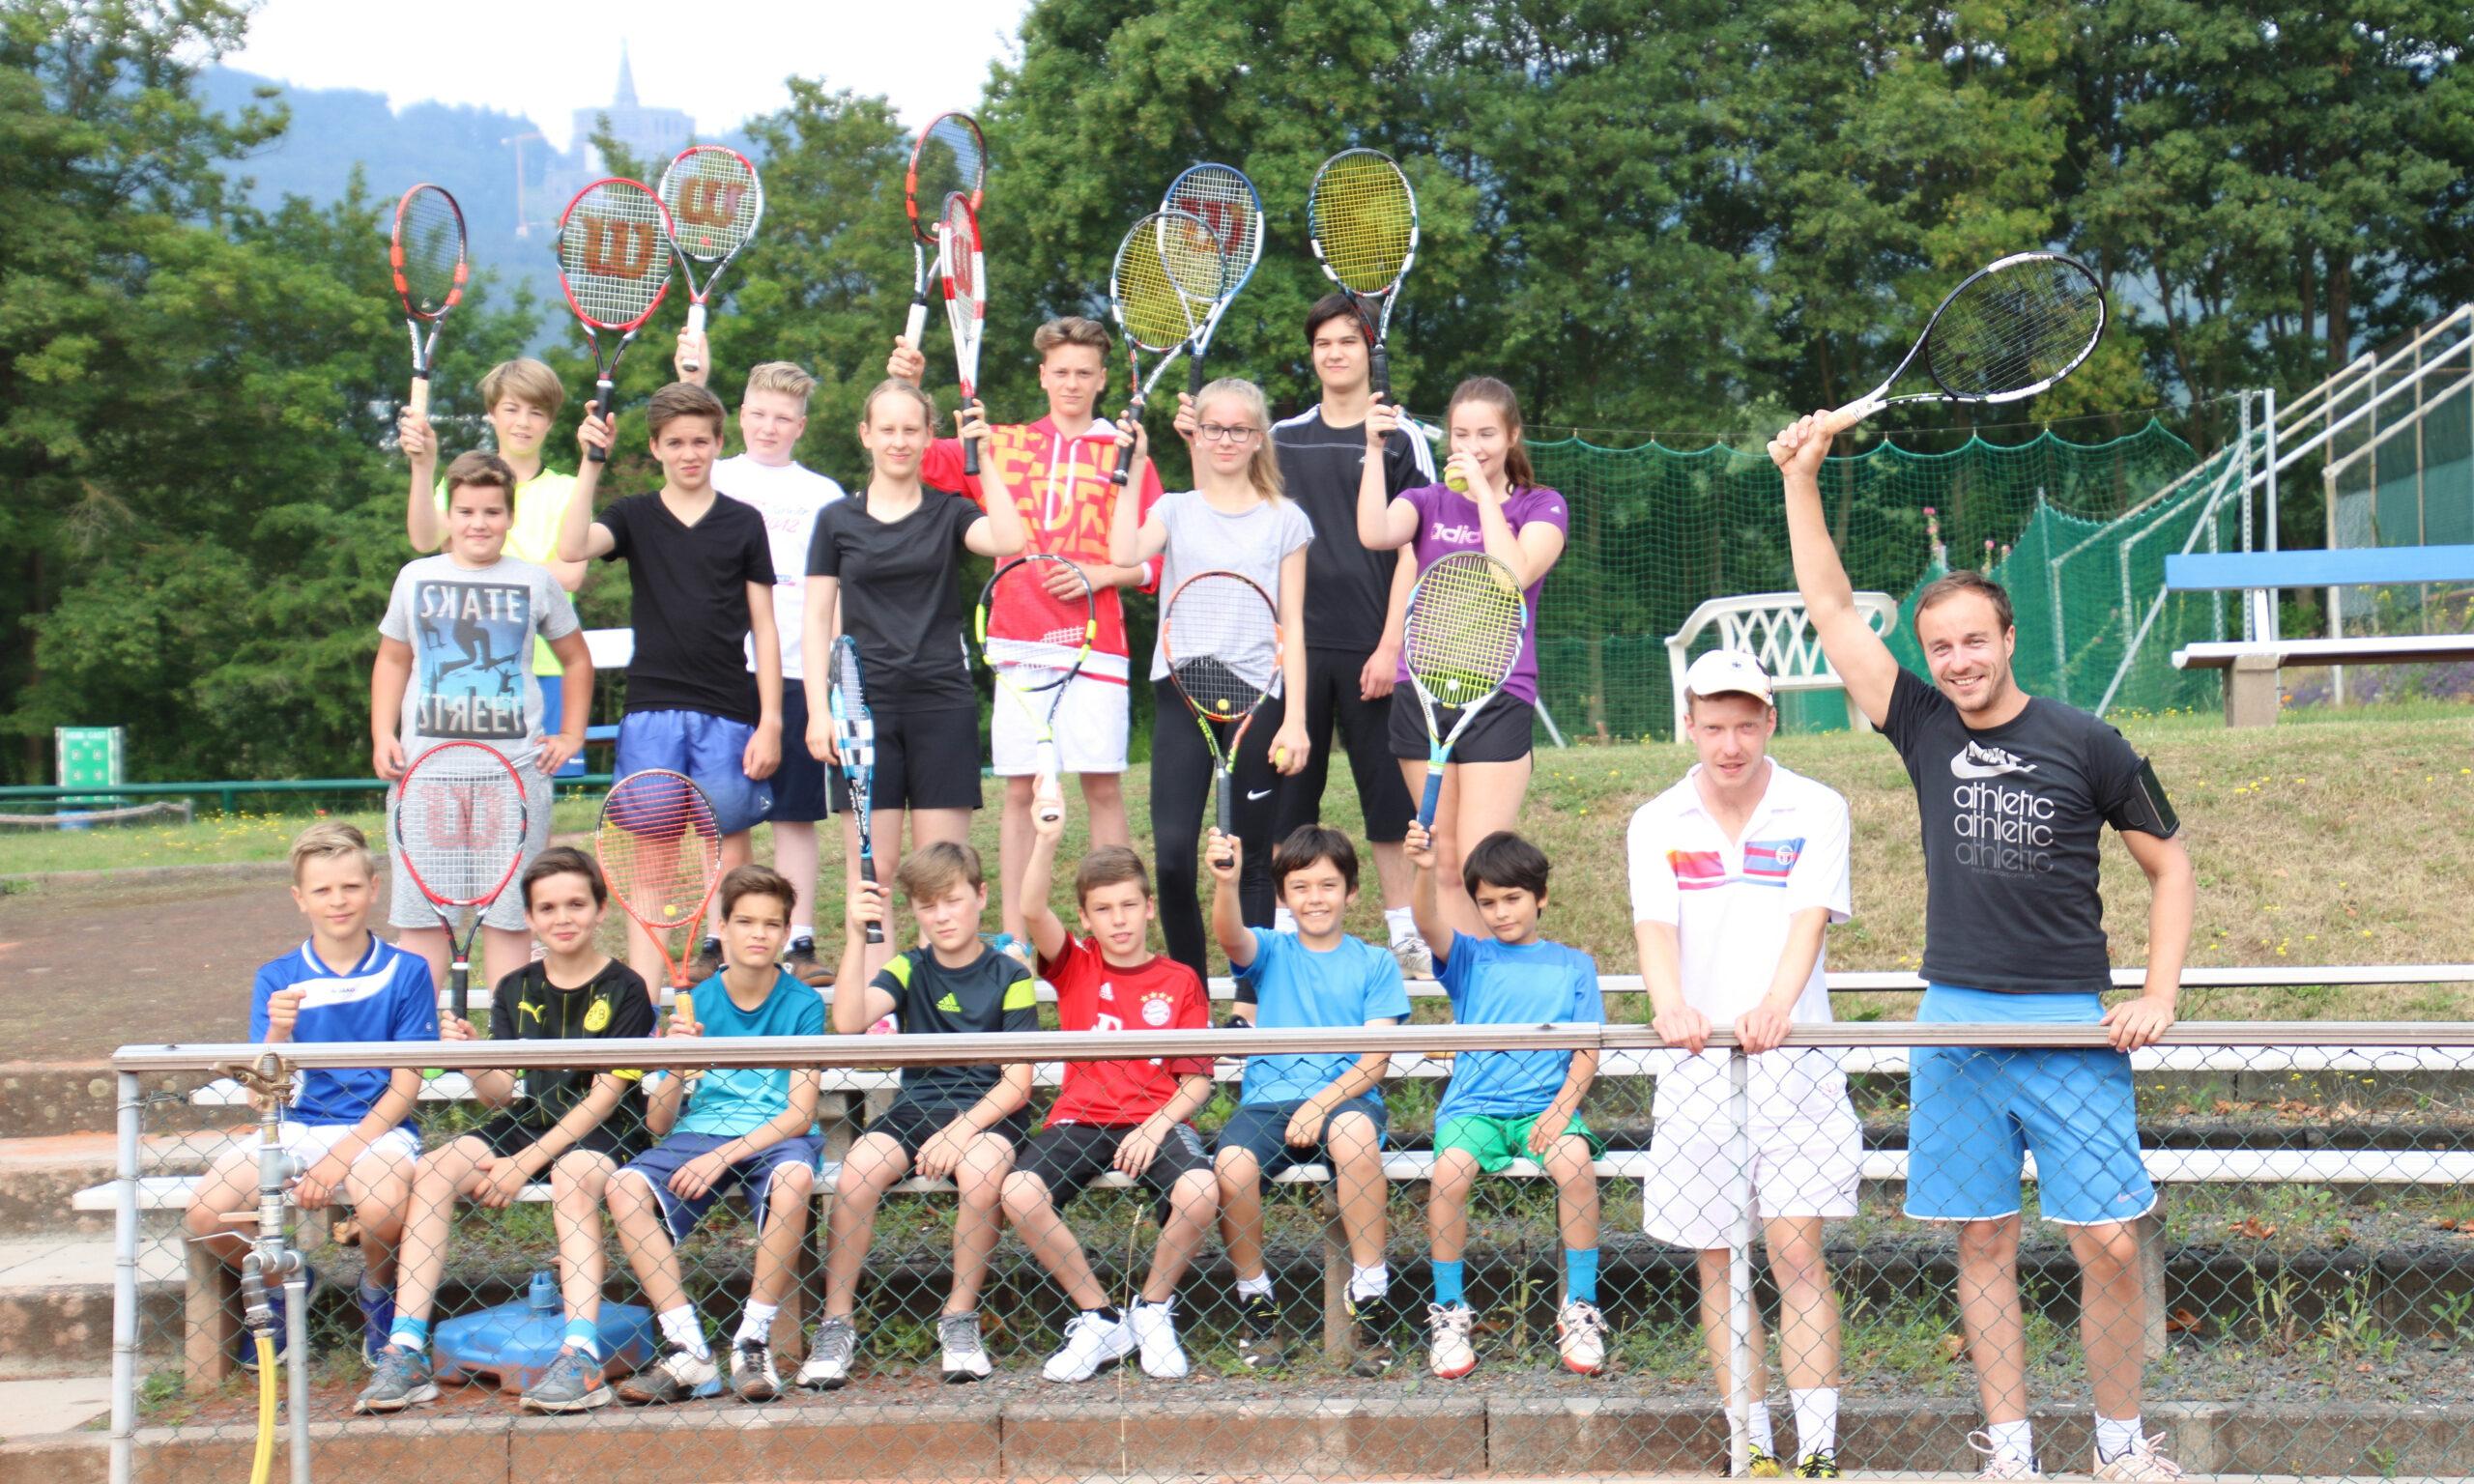 Tenniscamp blau weiss kassel